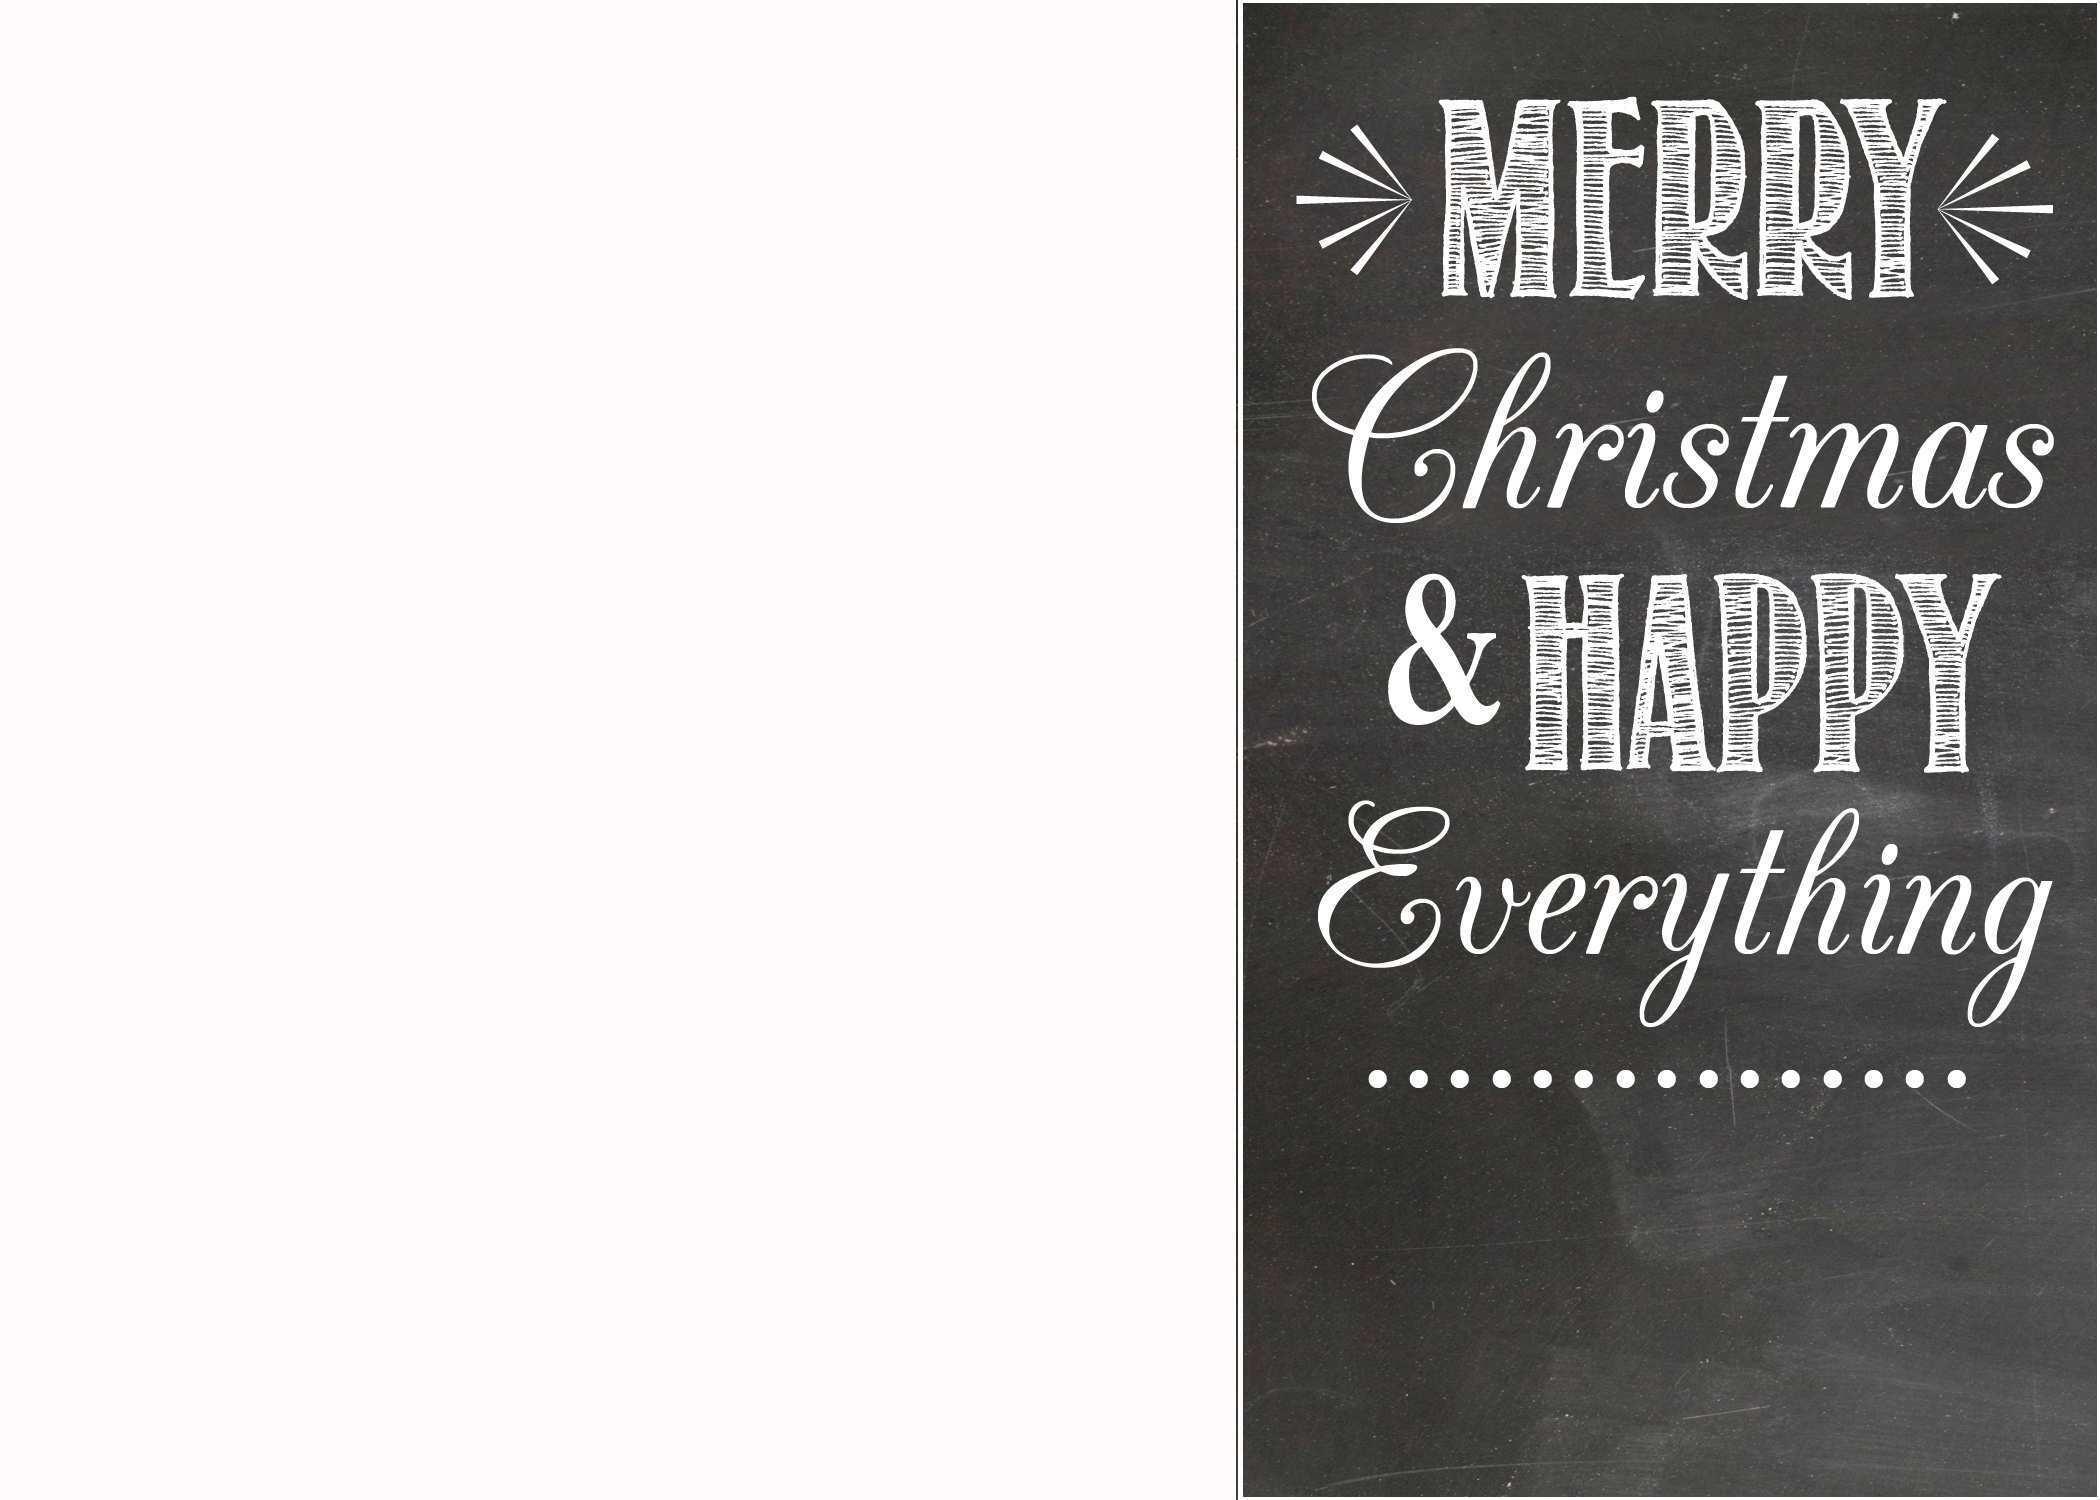 80 Creating Christmas Card Outline Template PSD File with Christmas Card Outline Template